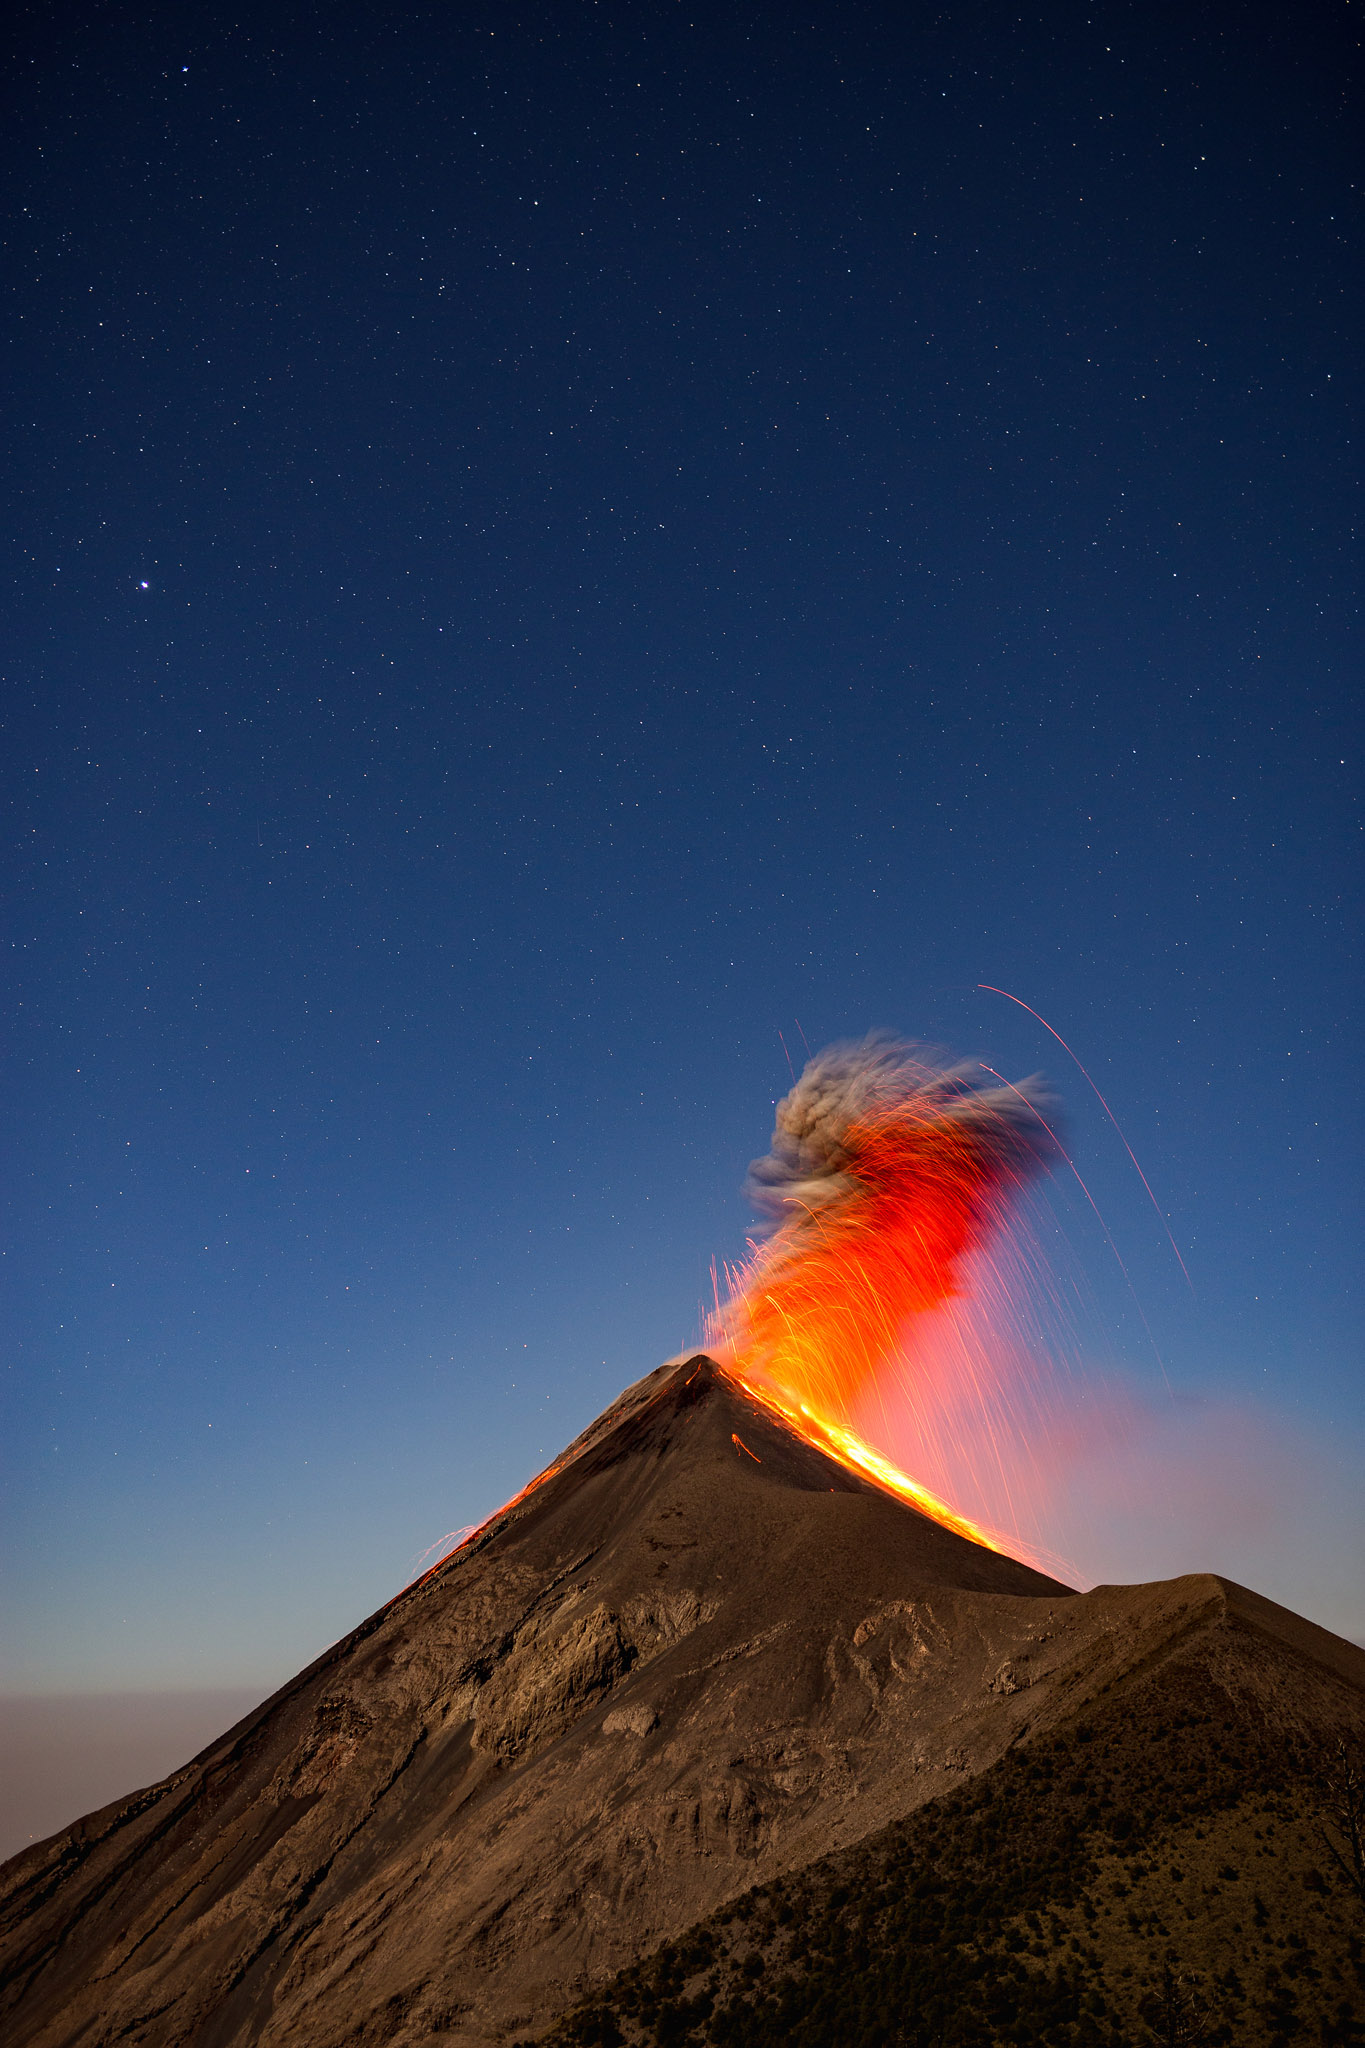 active-volcan-fuego-eruption-acatenango-guatemala-hike-tour-2.jpg